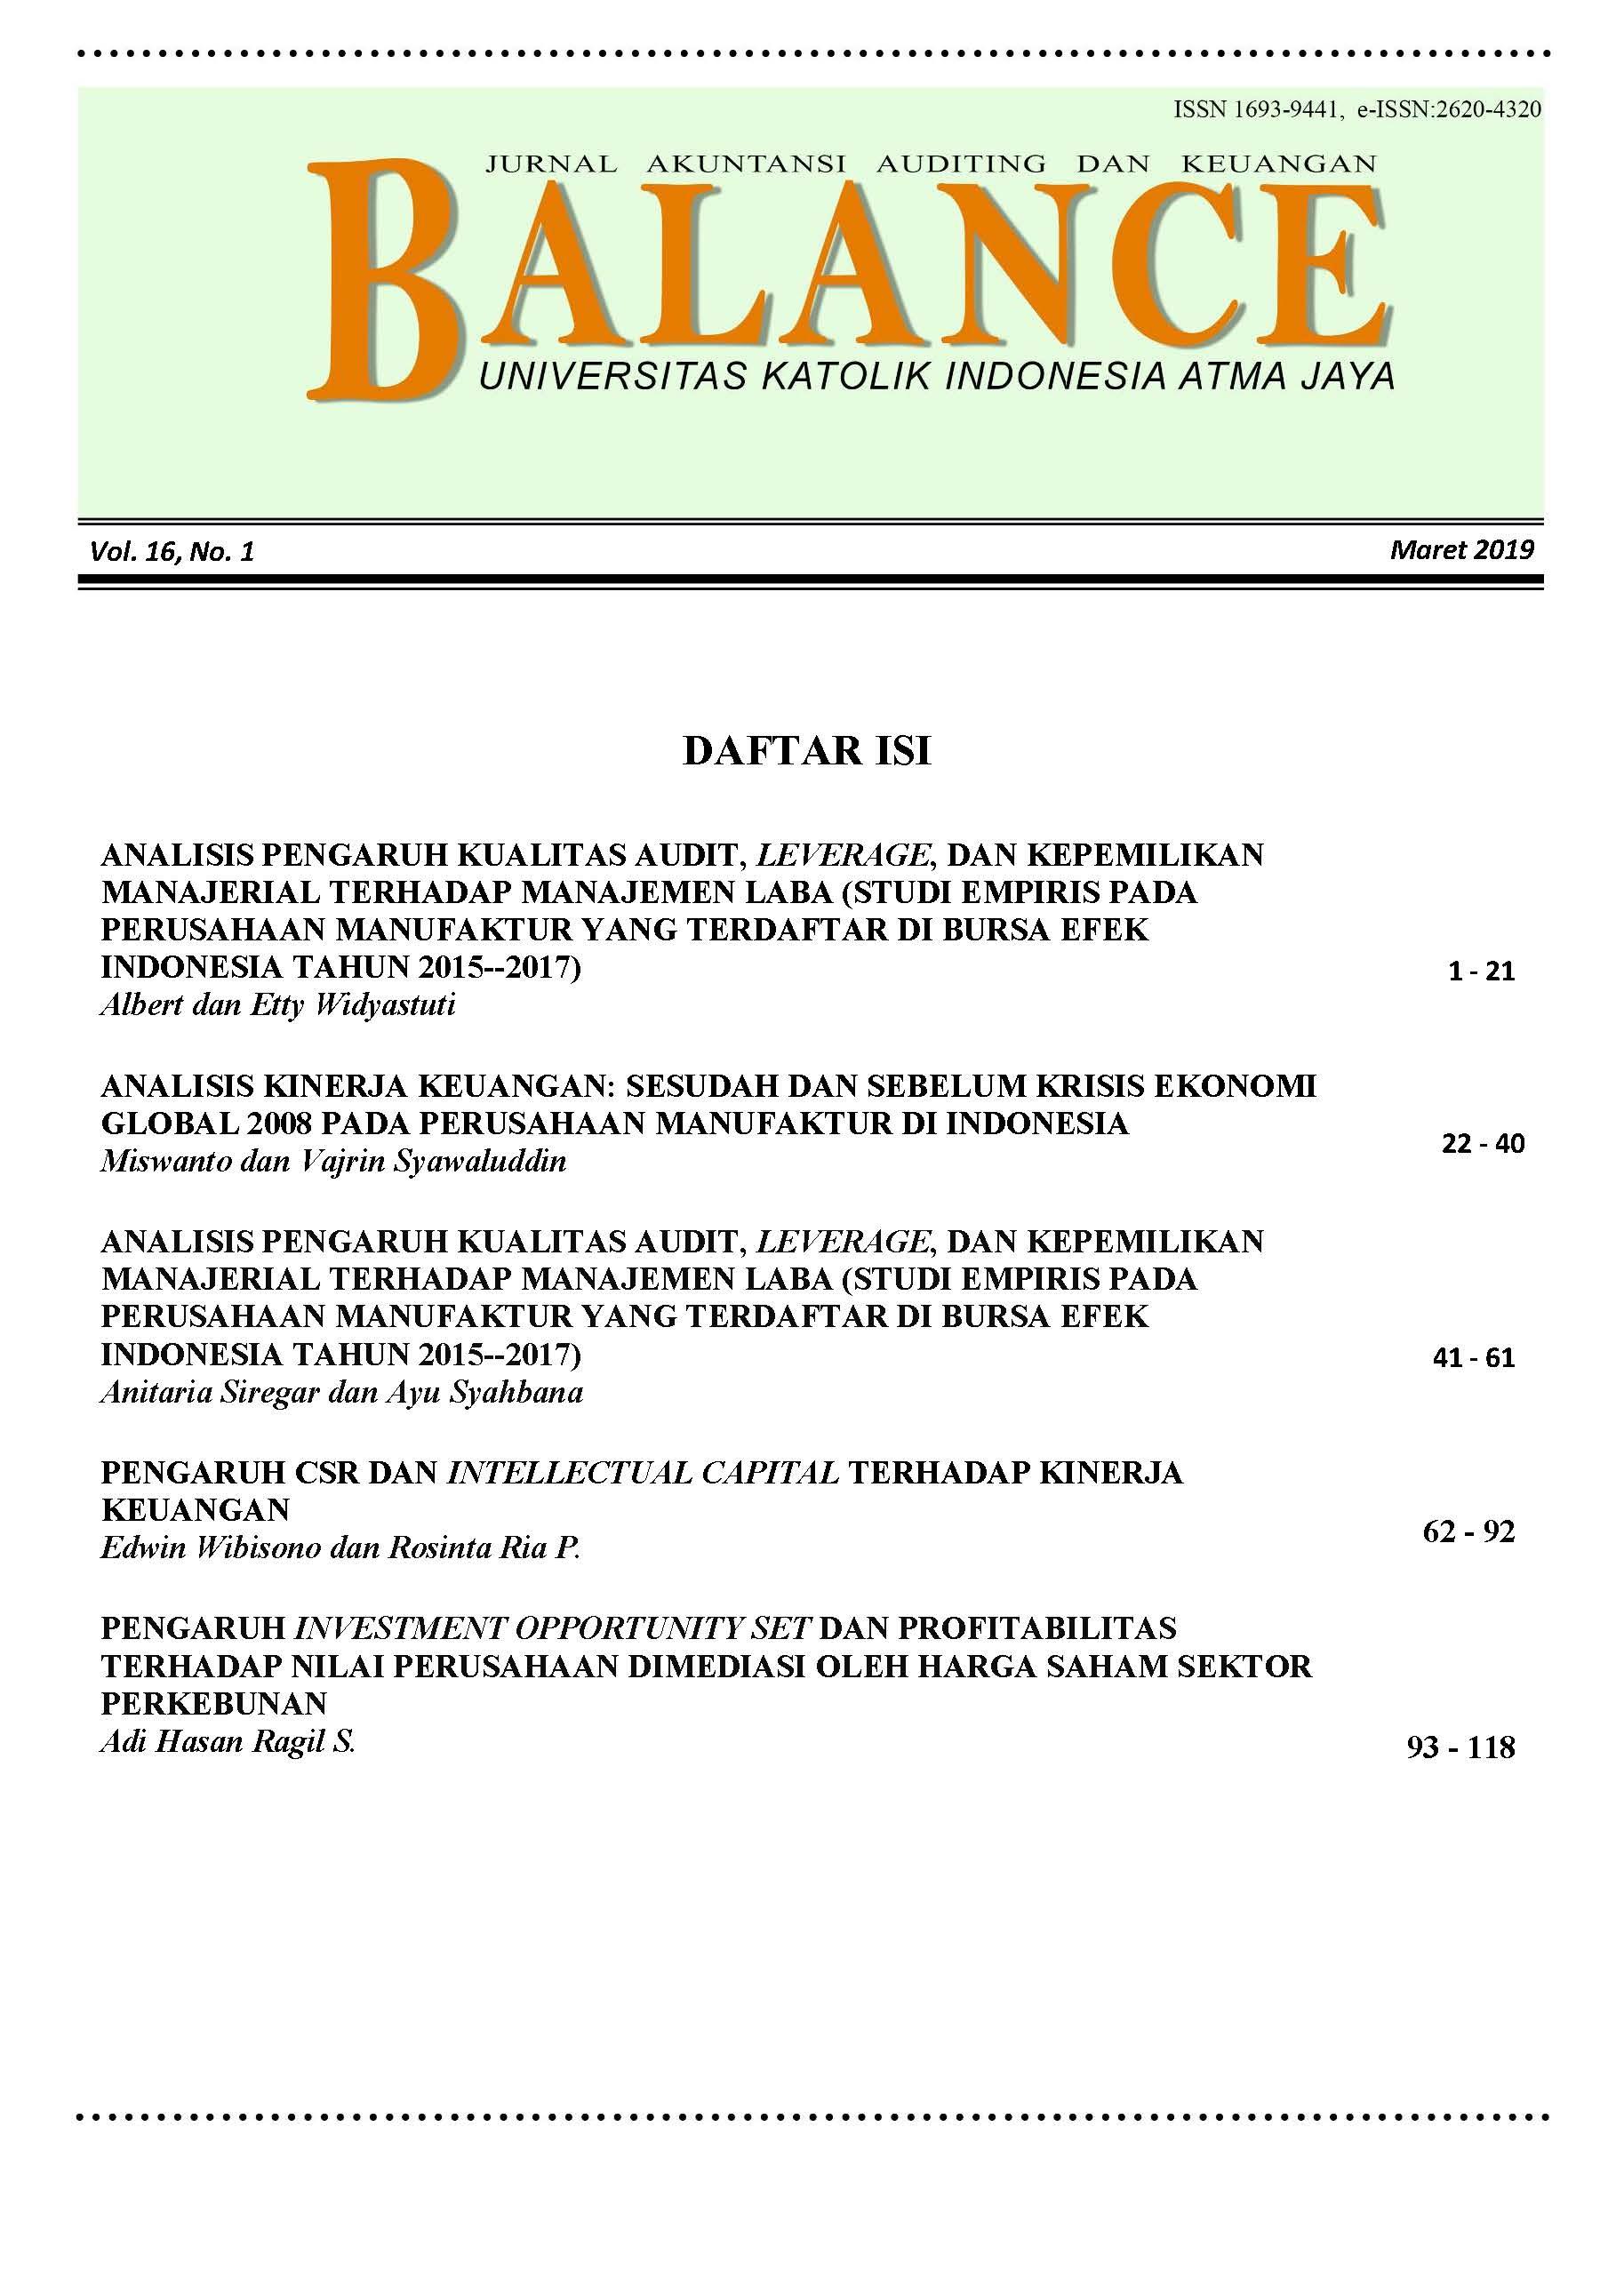 BALANCE: Jurnal Akuntansi, Auditing dan Keuangan, Vol.16 No.1 2019